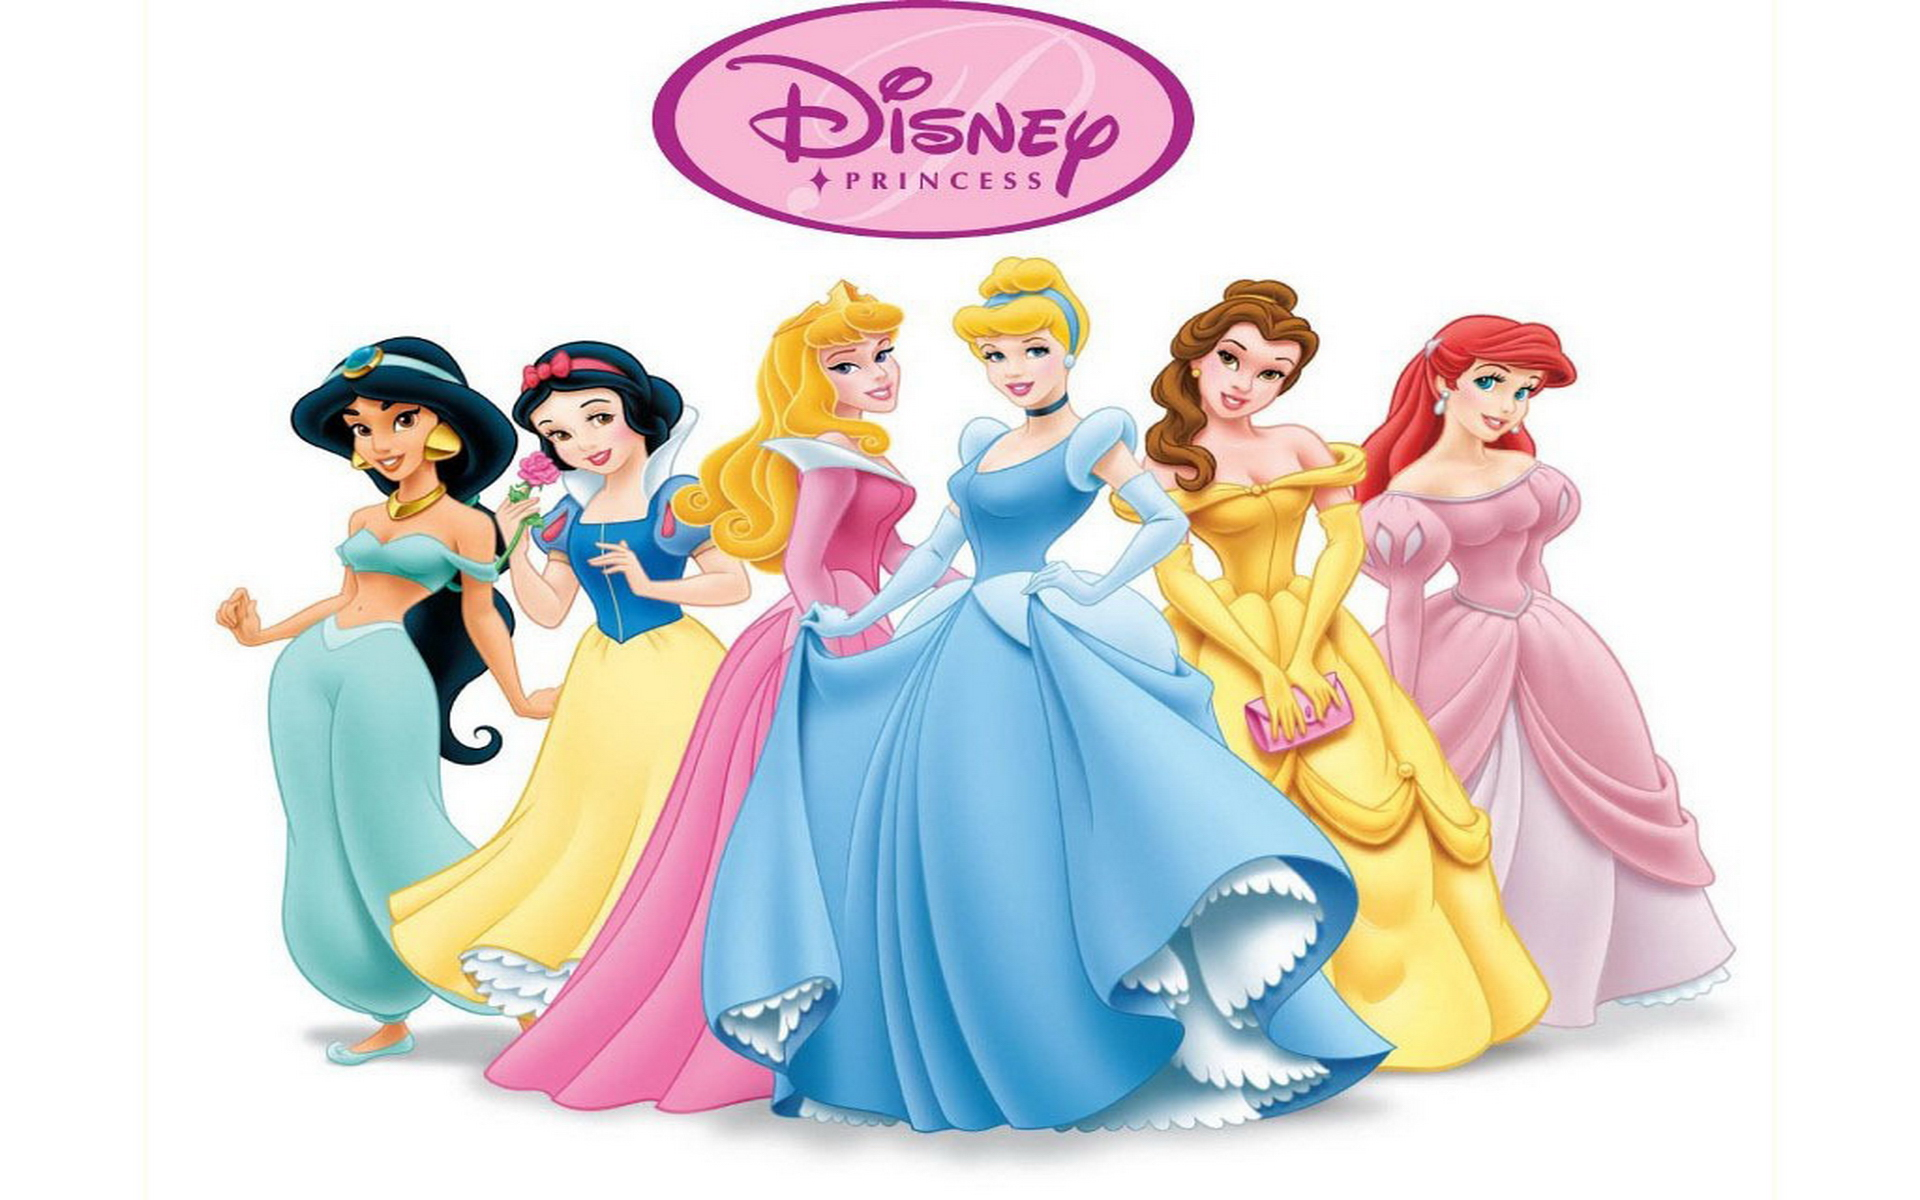 Princesas disney hd wallpaper princesas disney hd wallpaper thecheapjerseys Choice Image